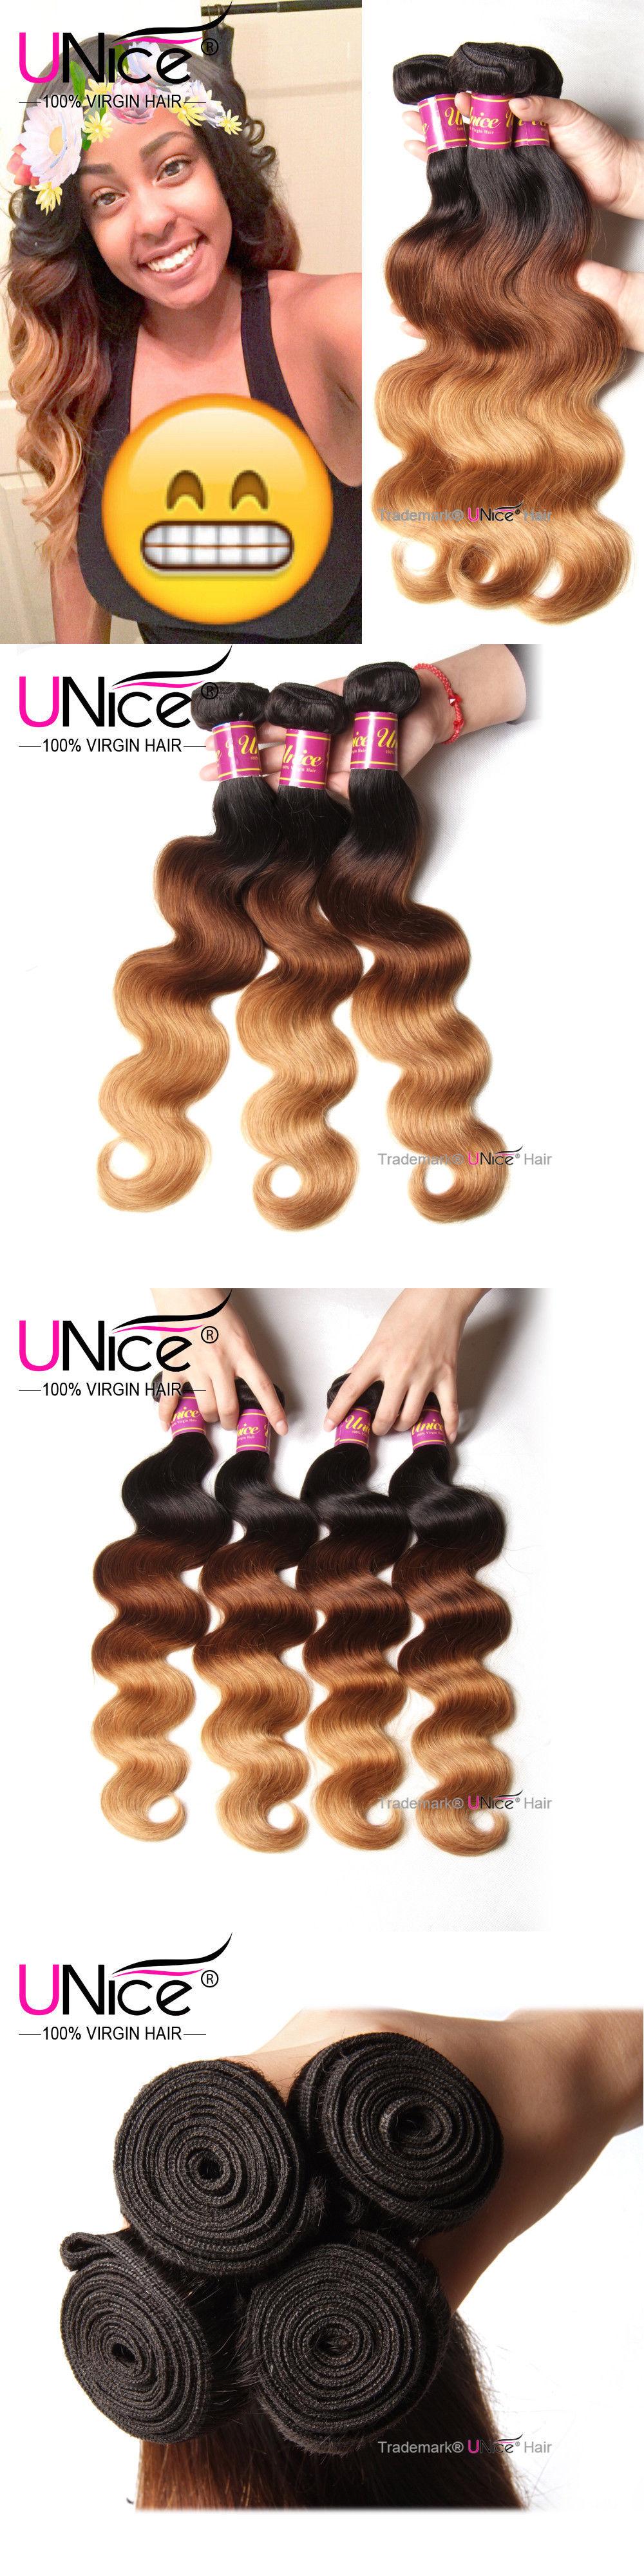 Hair Extensions Unice Brazilian Body Wave Human Hair 3 Bundles